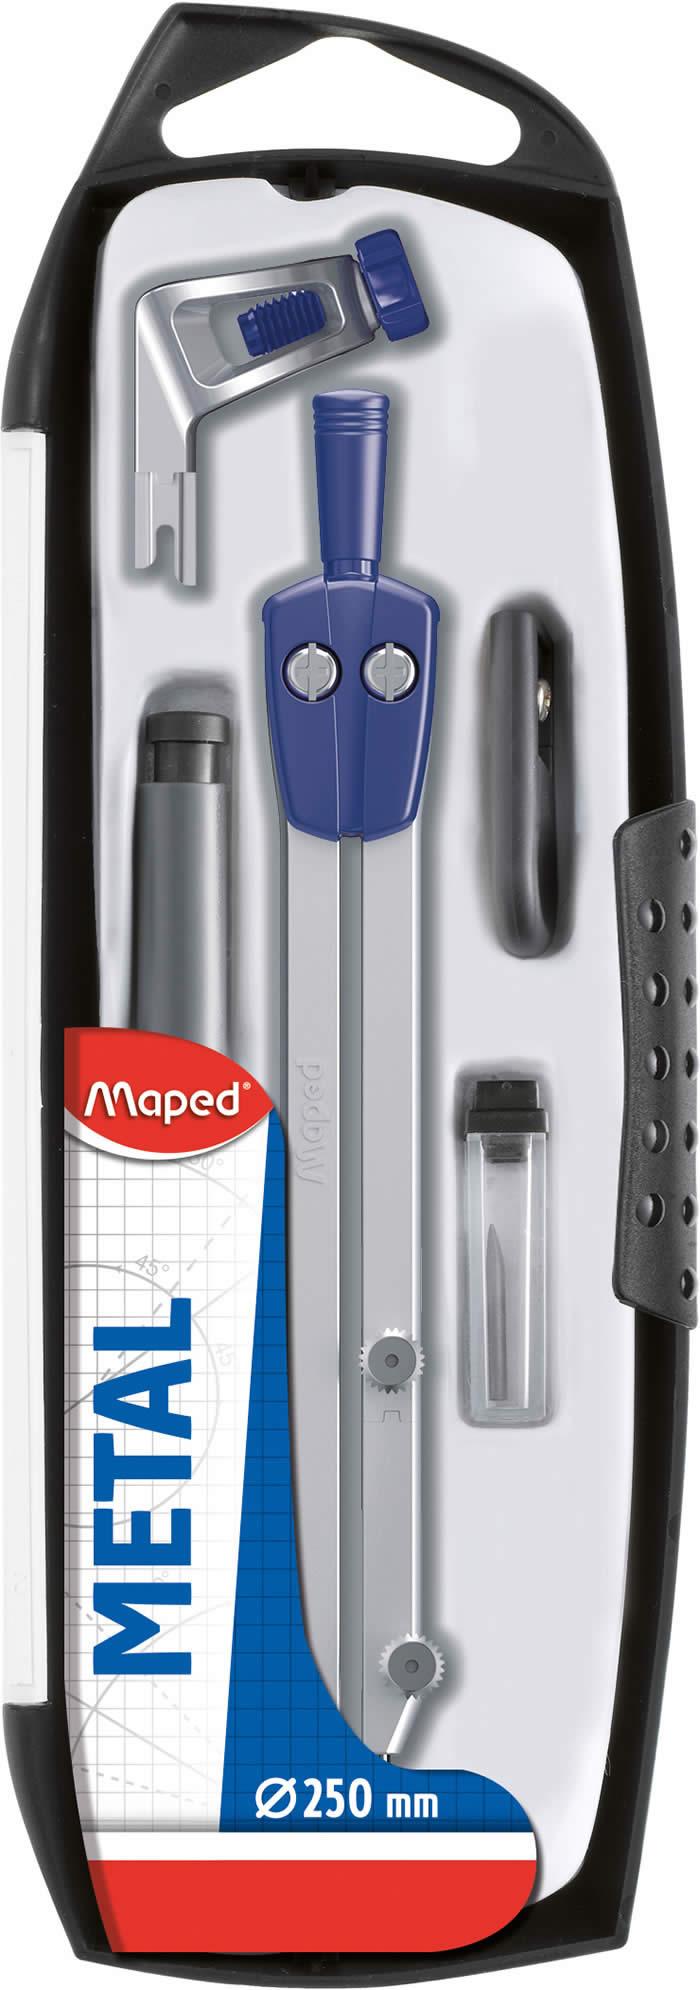 Compas maped 5 piezas start (197513)